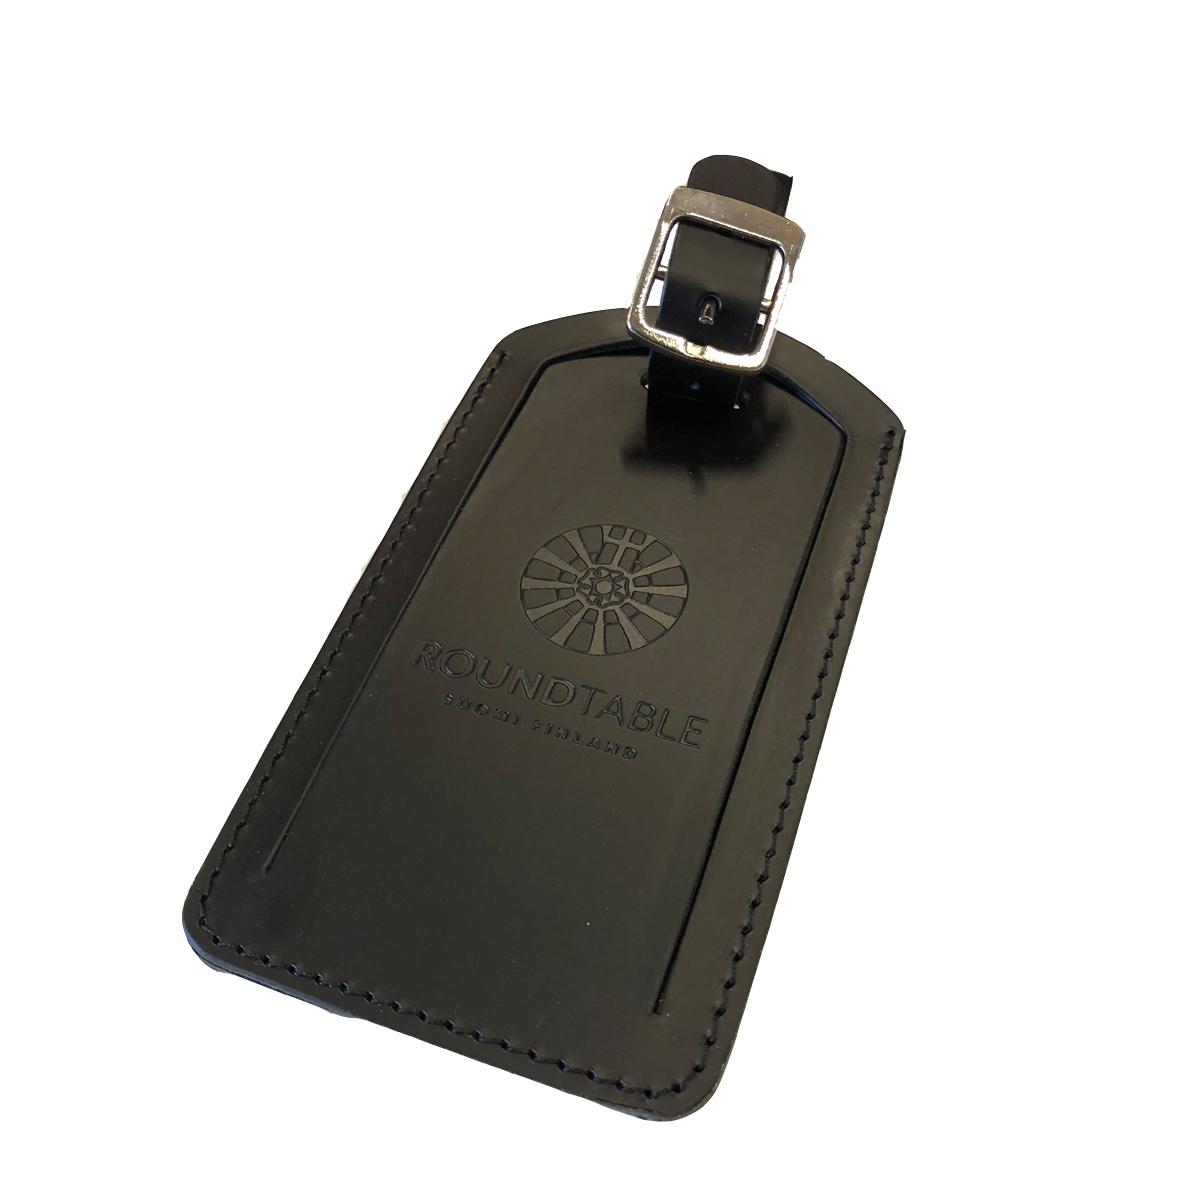 RT-Luggage tag